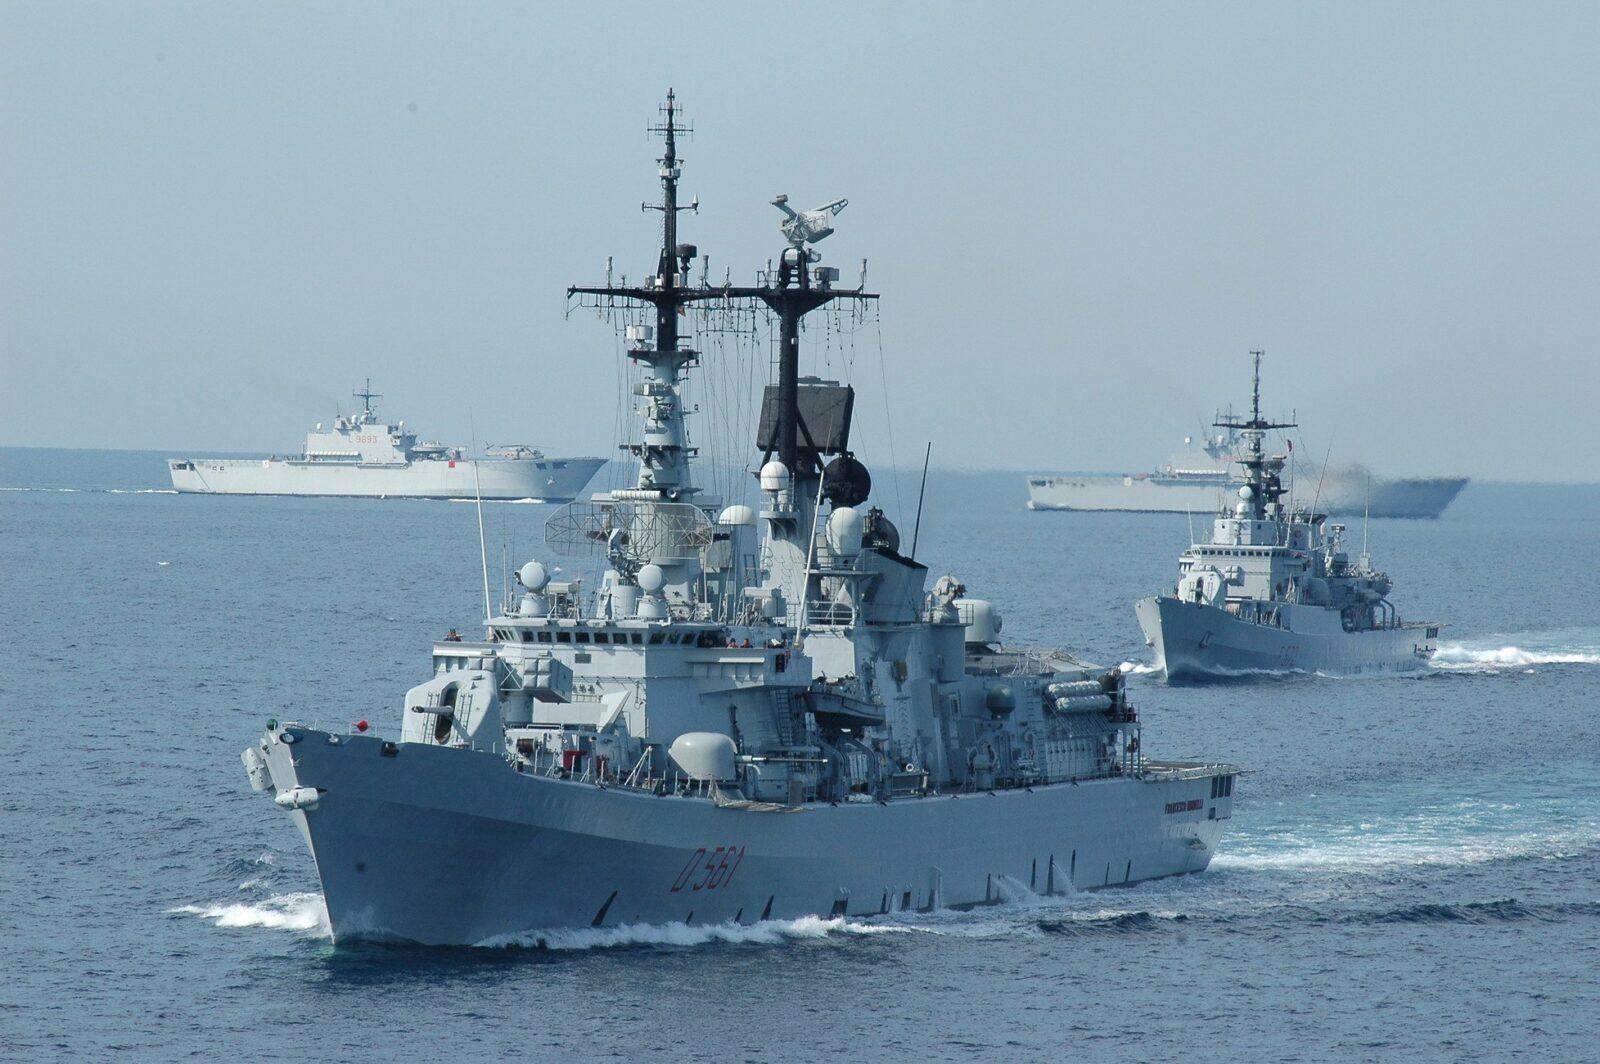 Amianto Marina Militare